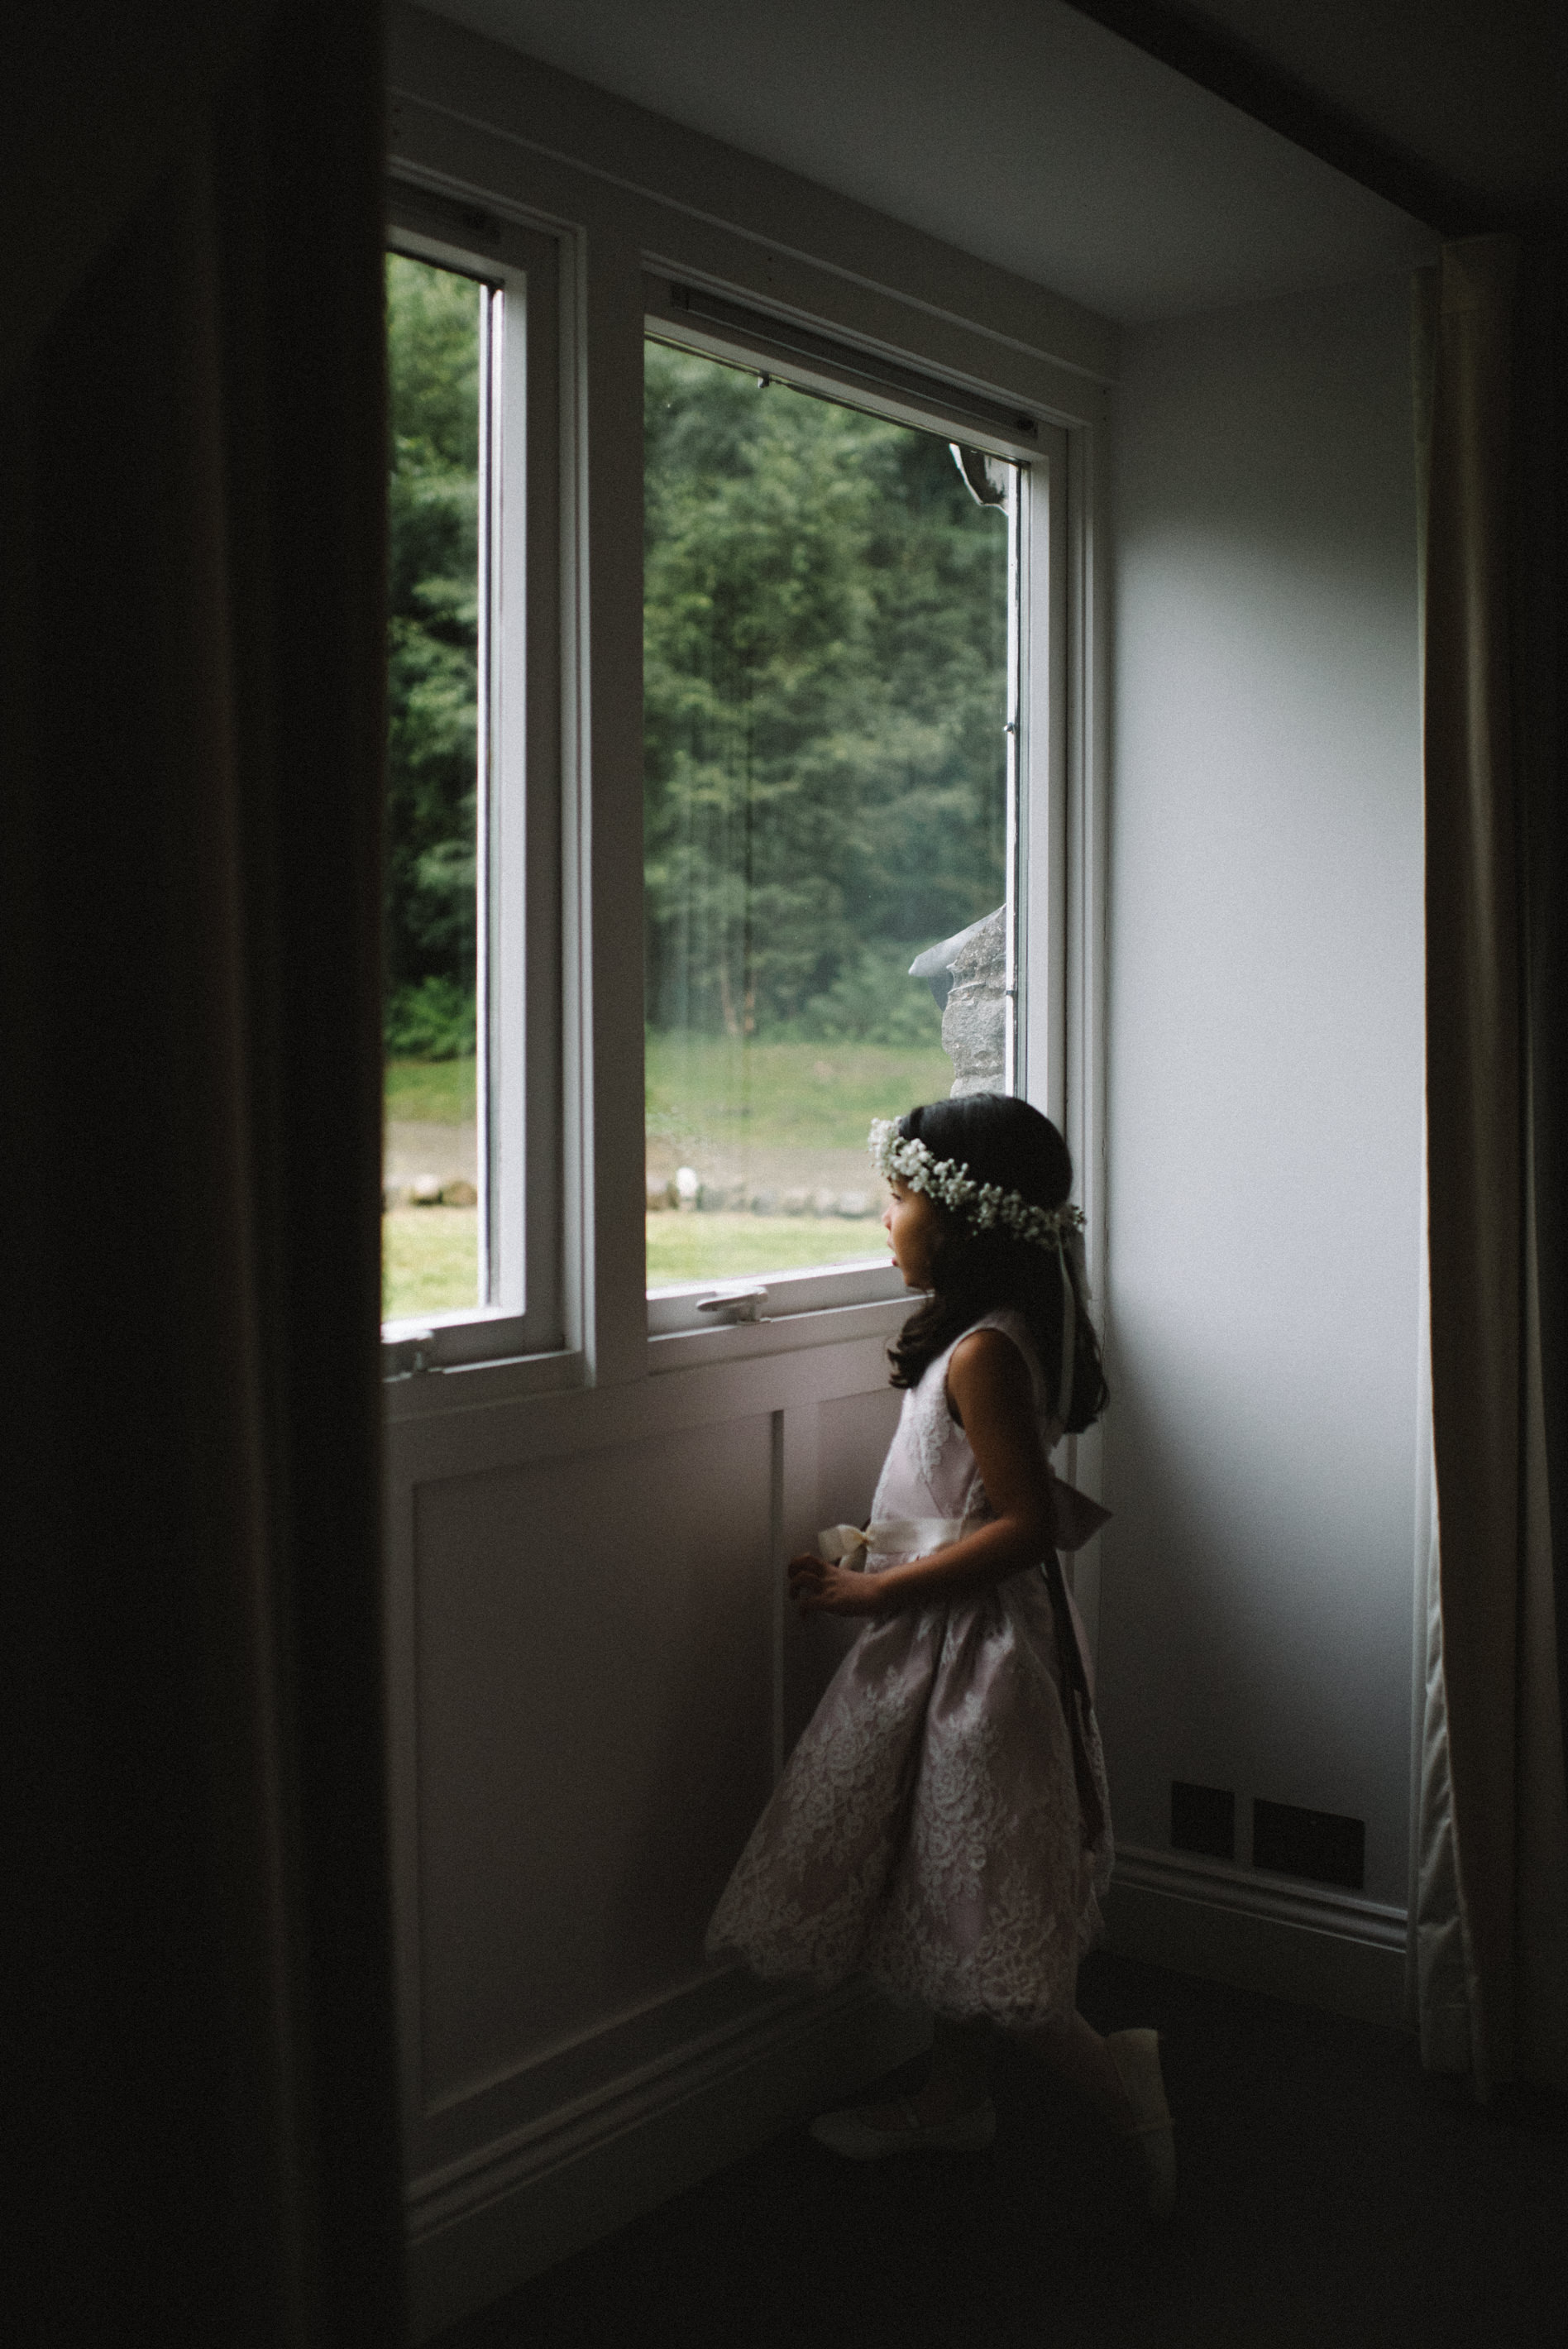 0057-LISA-DEVINE-PHOTOGRAPHY-ALTERNATIVE-WEDDING-PHOTOGRAPHY-SCOTLAND-DESTINATION-WEDDINGS-GLASGOW-WEDDINGS-COOL-WEDDINGS-STYLISH-WEDDINGS.JPG